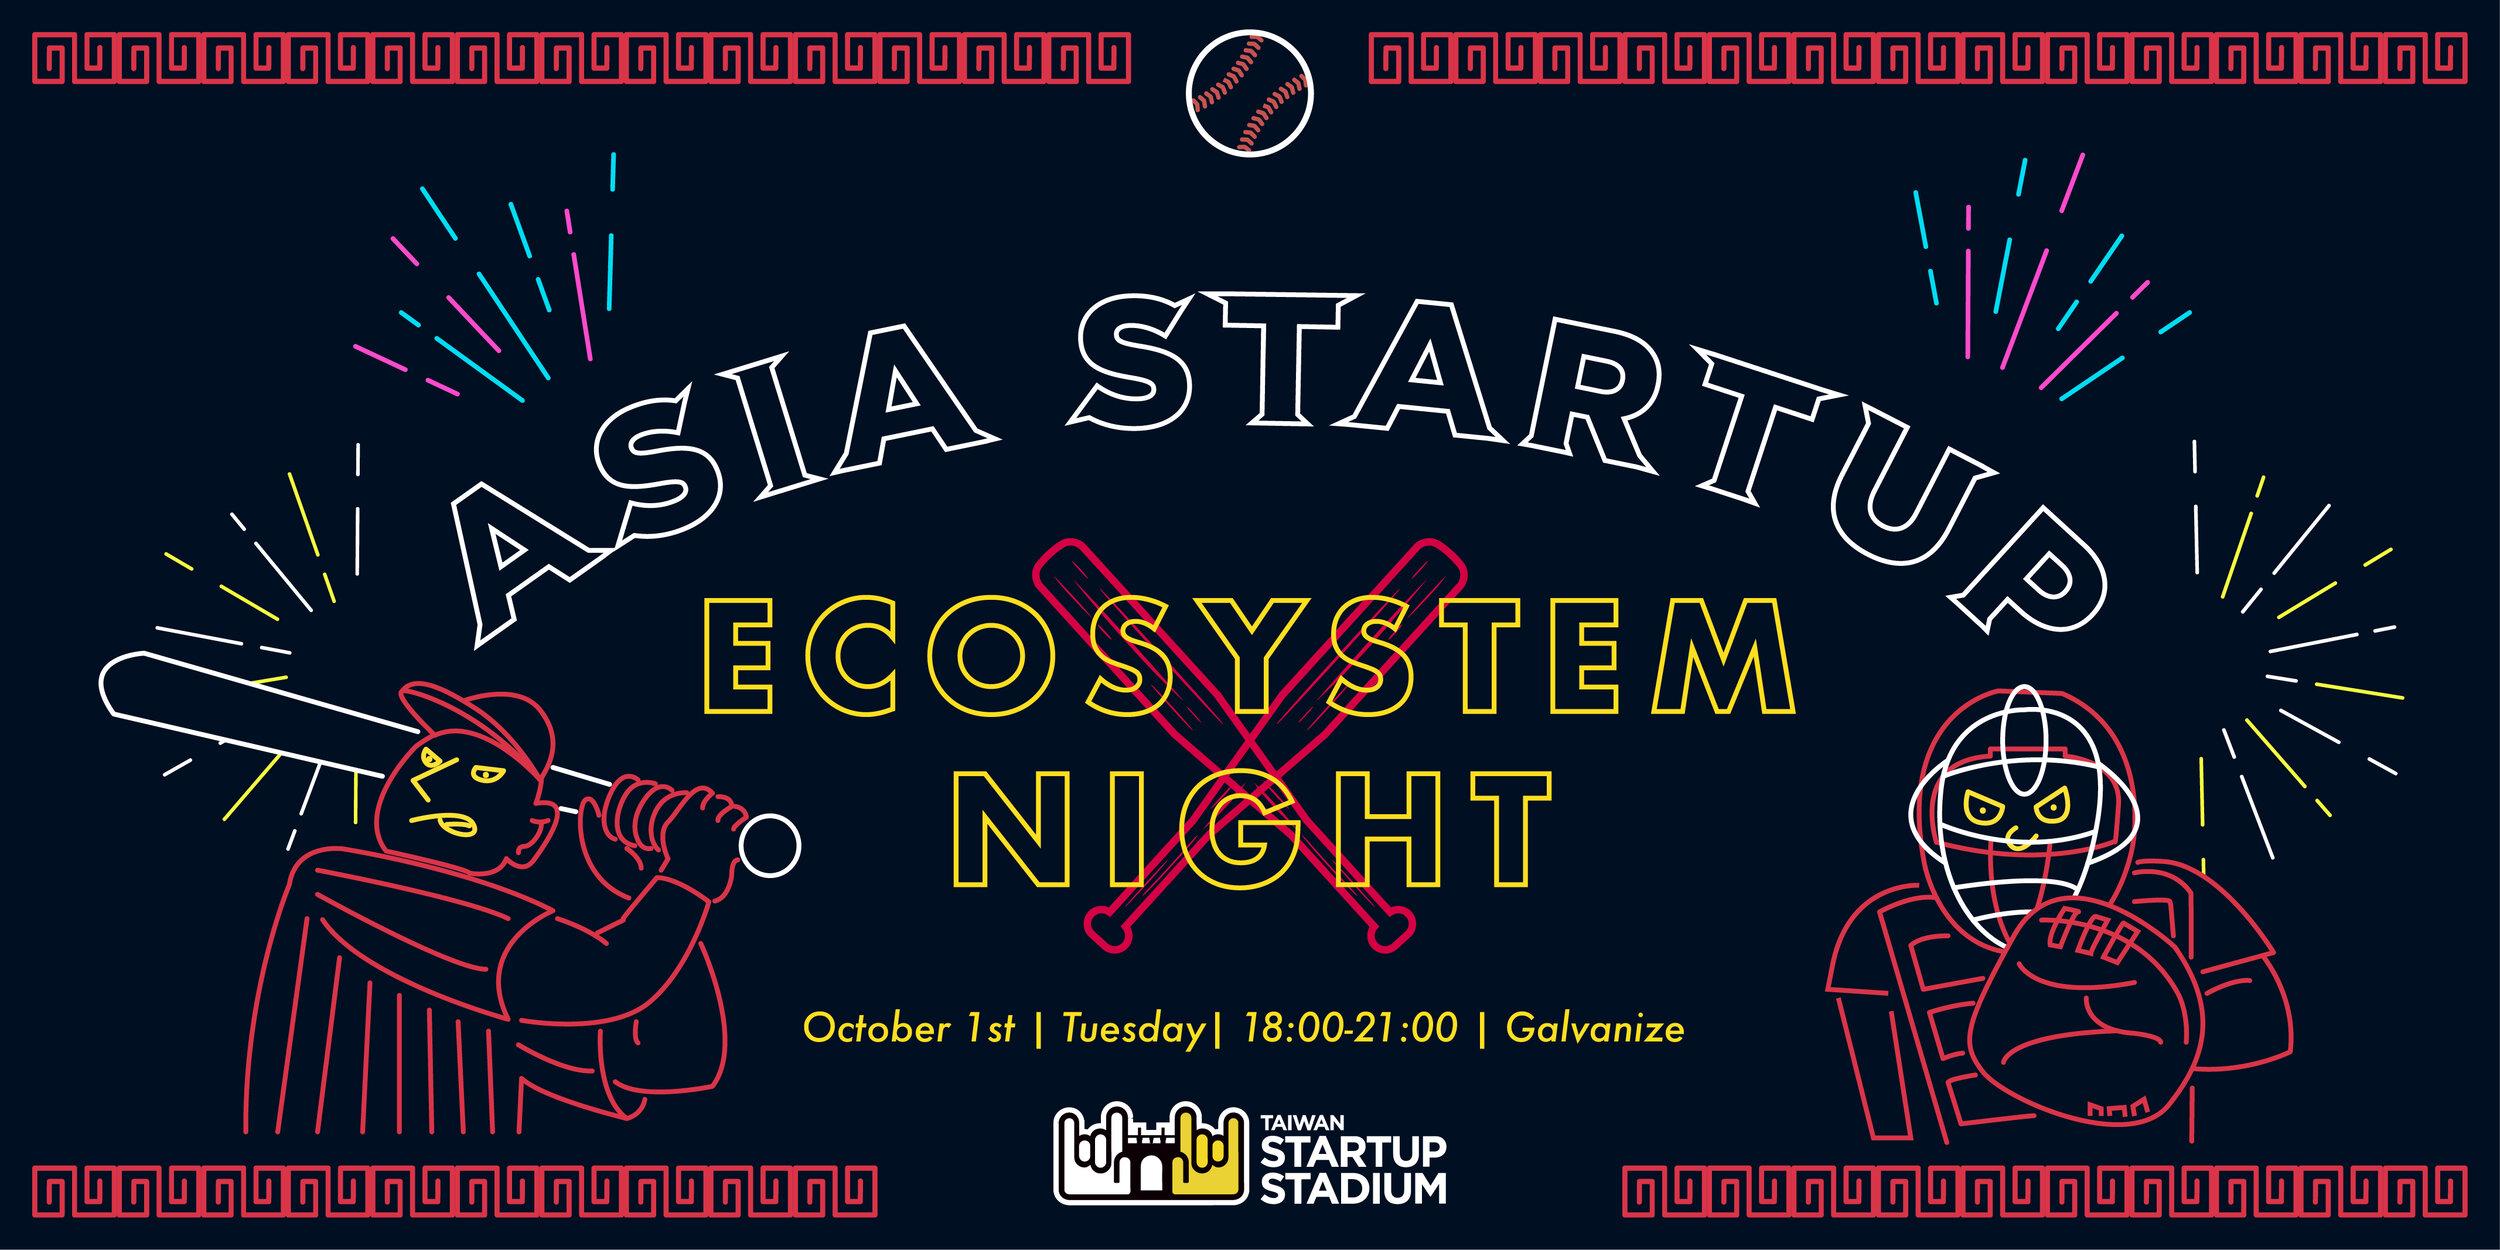 asia startup ecosystem night .jpg